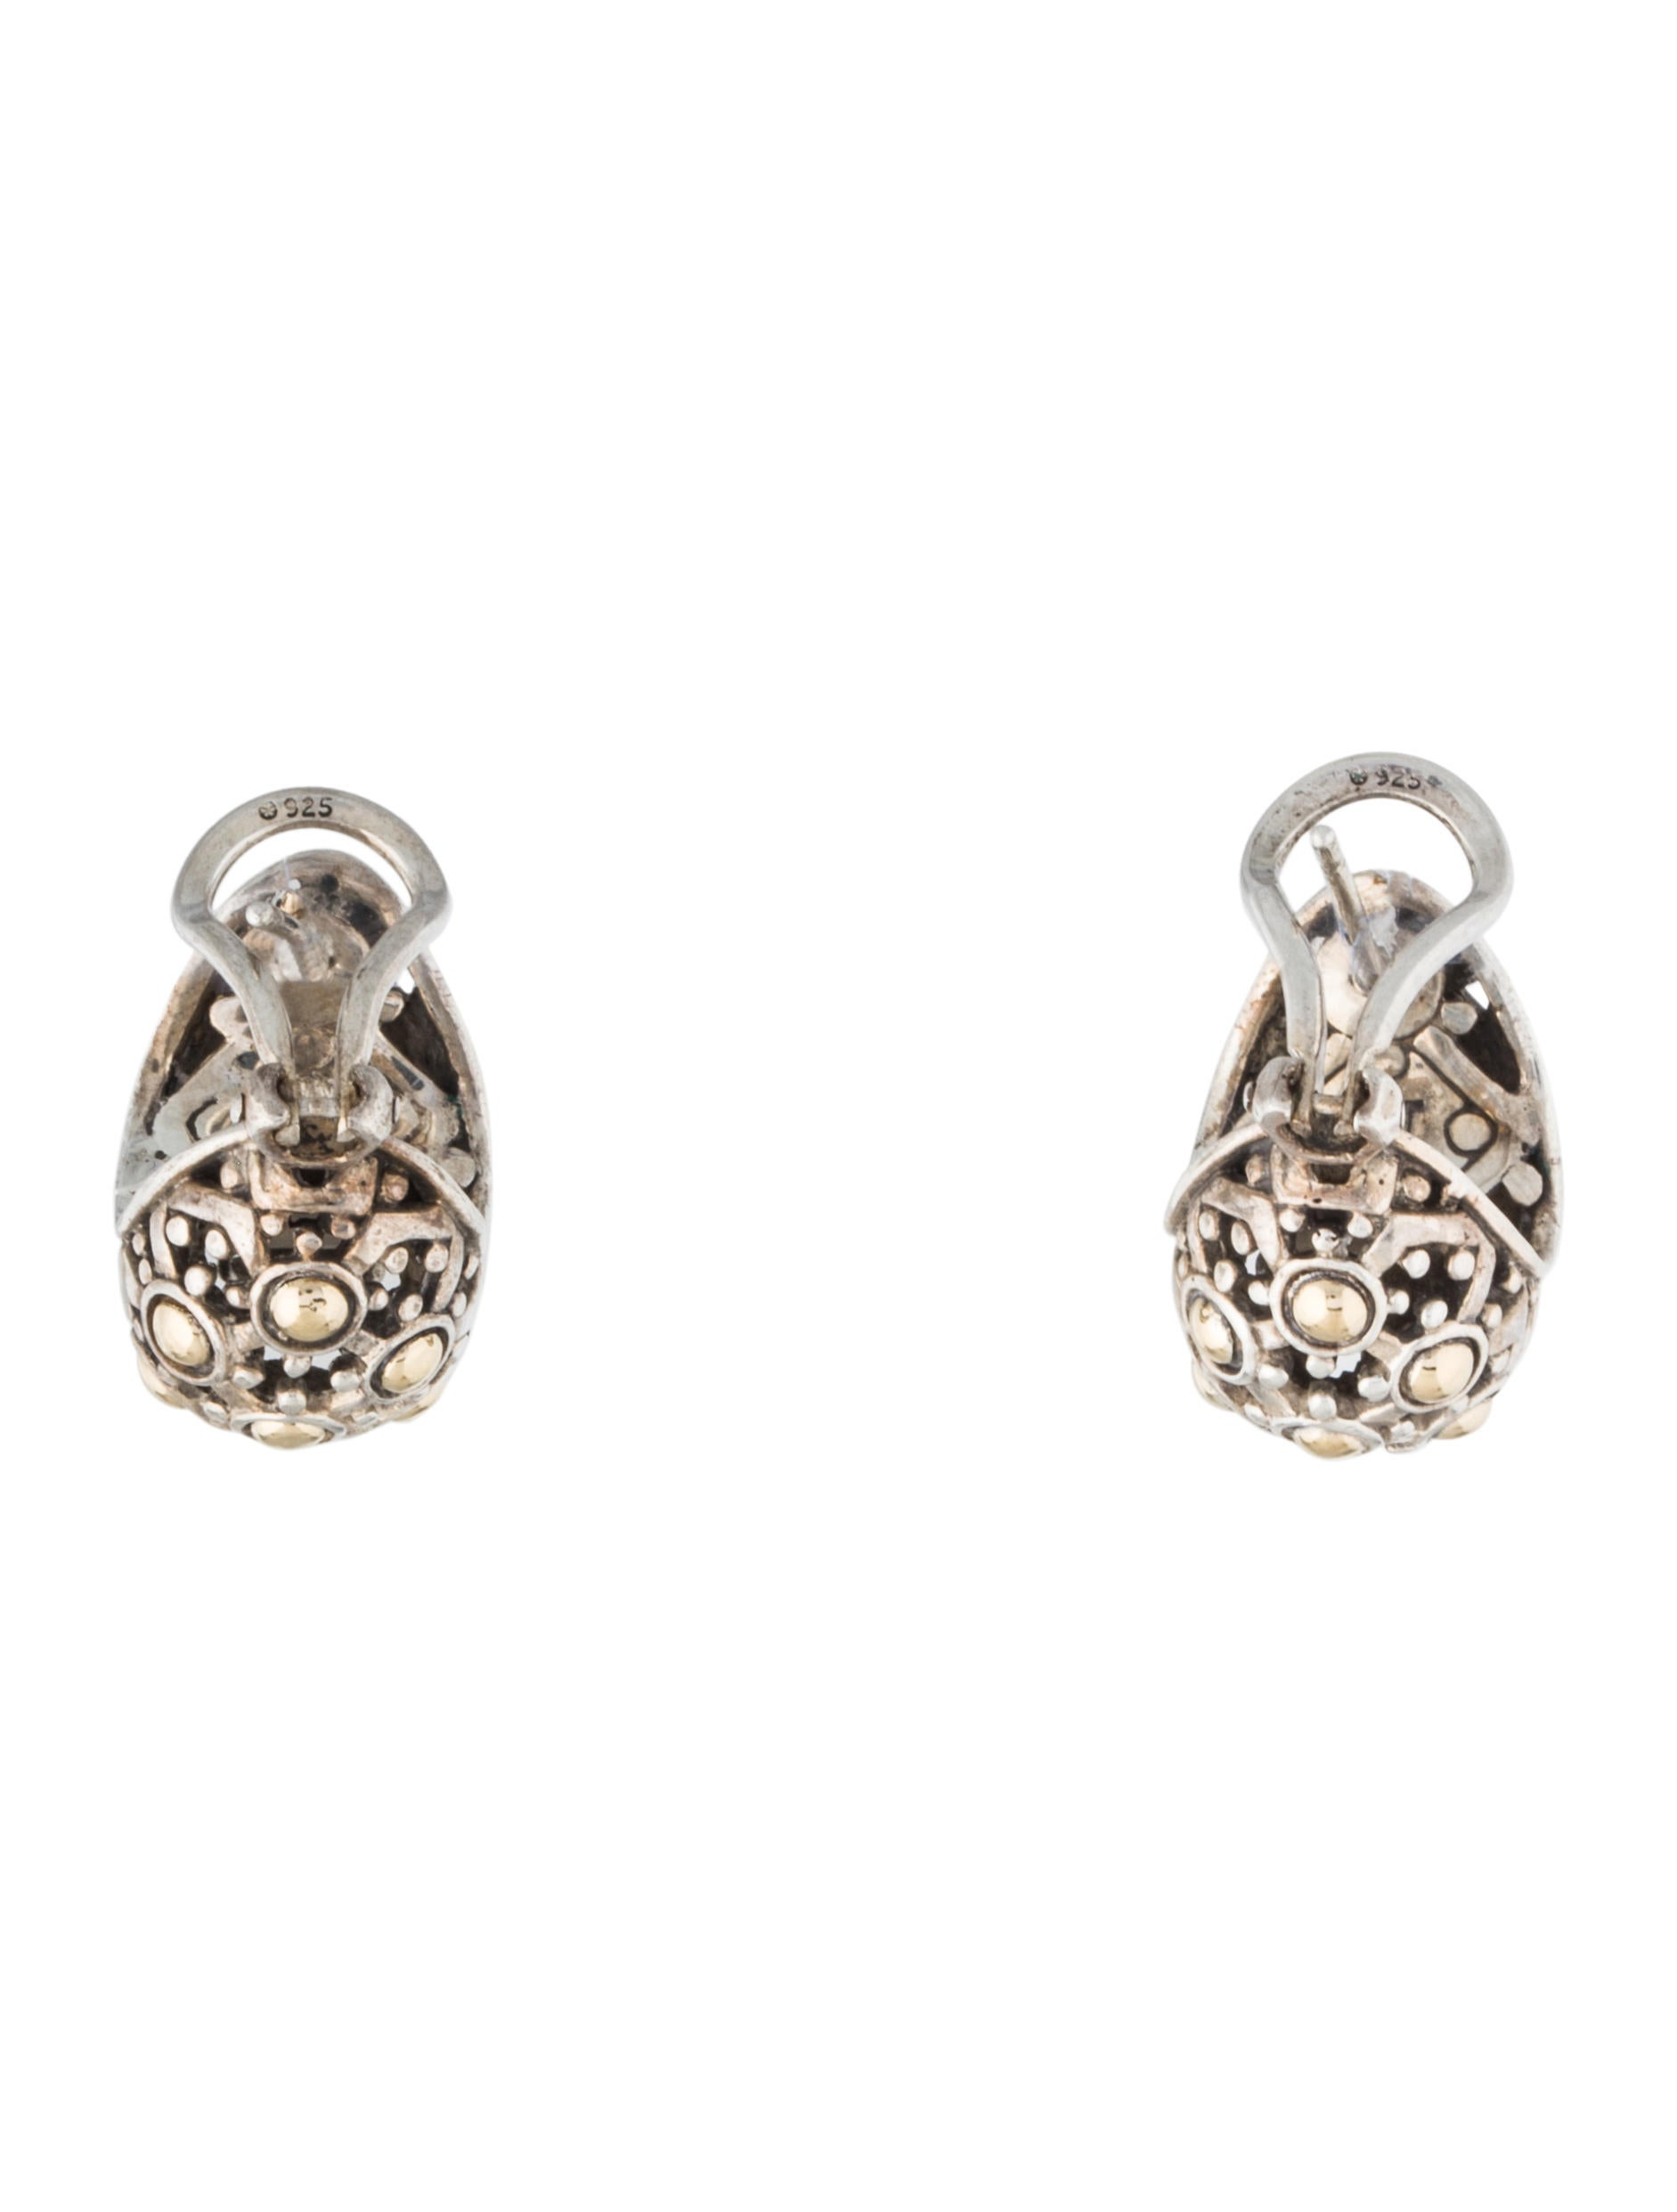 John hardy jaisalmer buddha belly earrings earrings for John hardy jewelry earrings